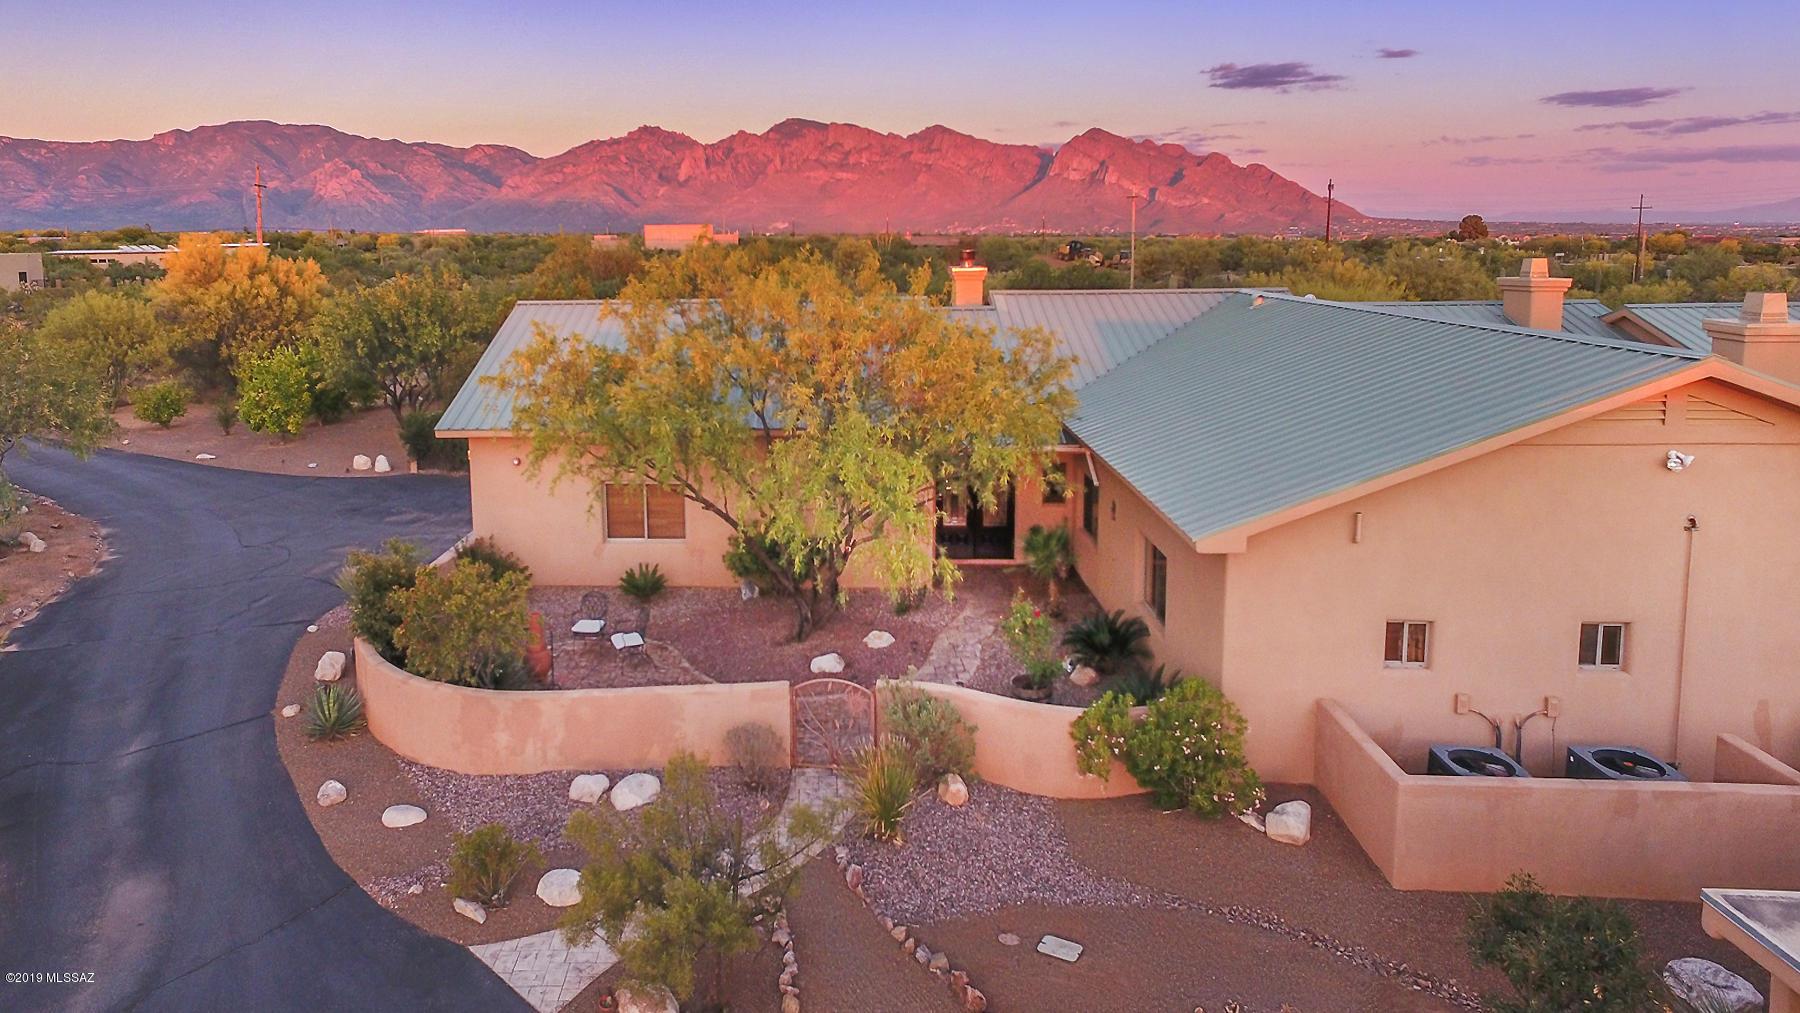 Photo of 12151 N Camino Del Plata, Oro Valley, AZ 85755